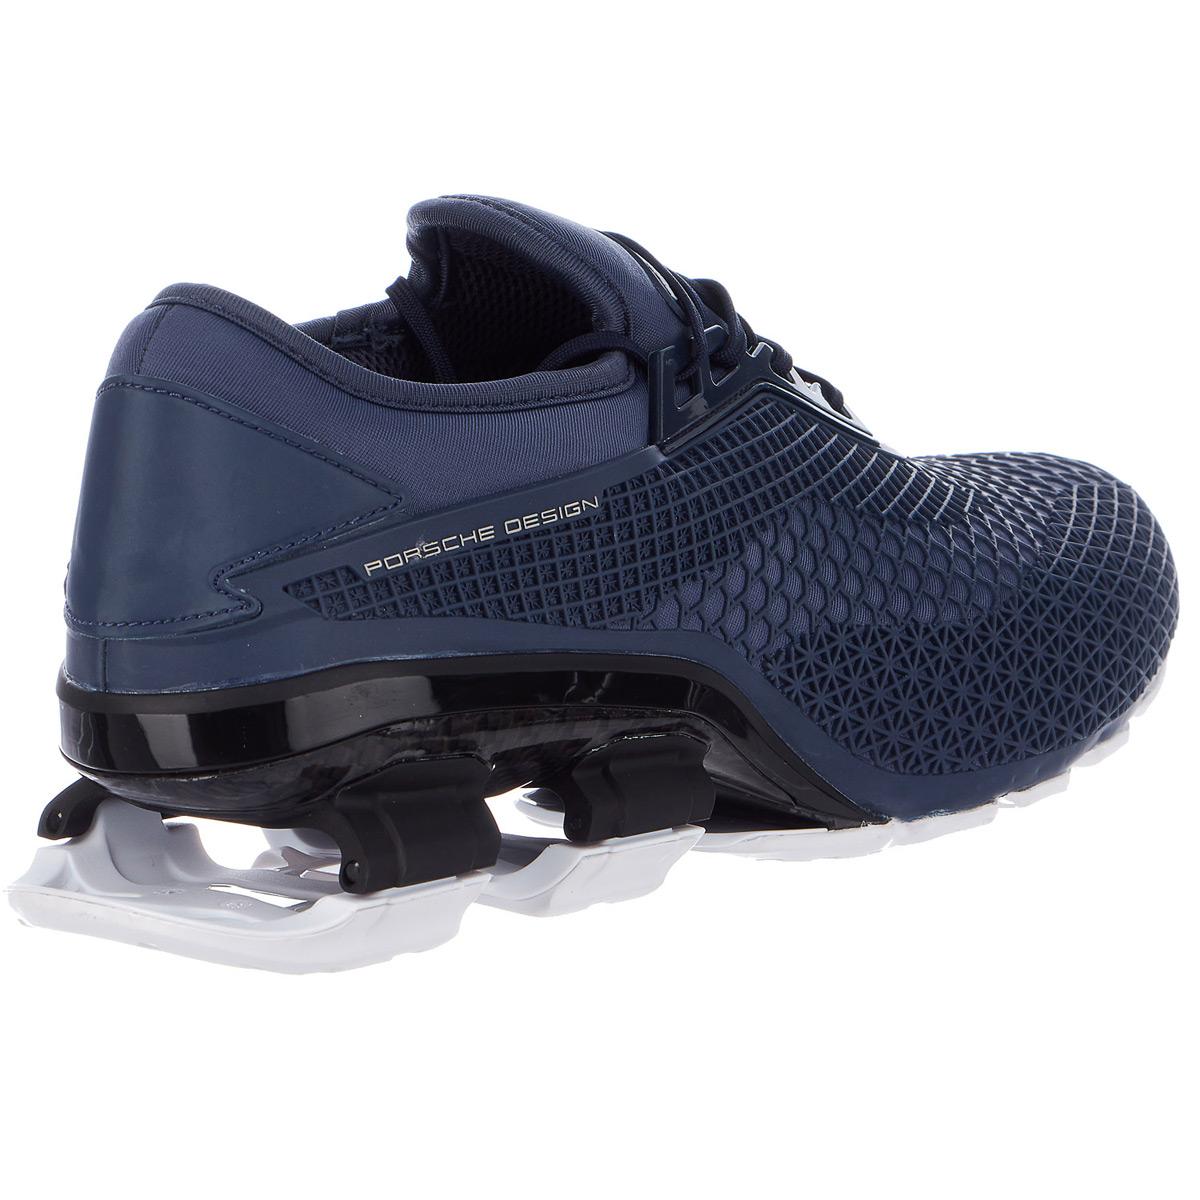 online retailer 789c2 336b0 cheap adidas porsche design sport bounce s4 white blue c3c6f ...